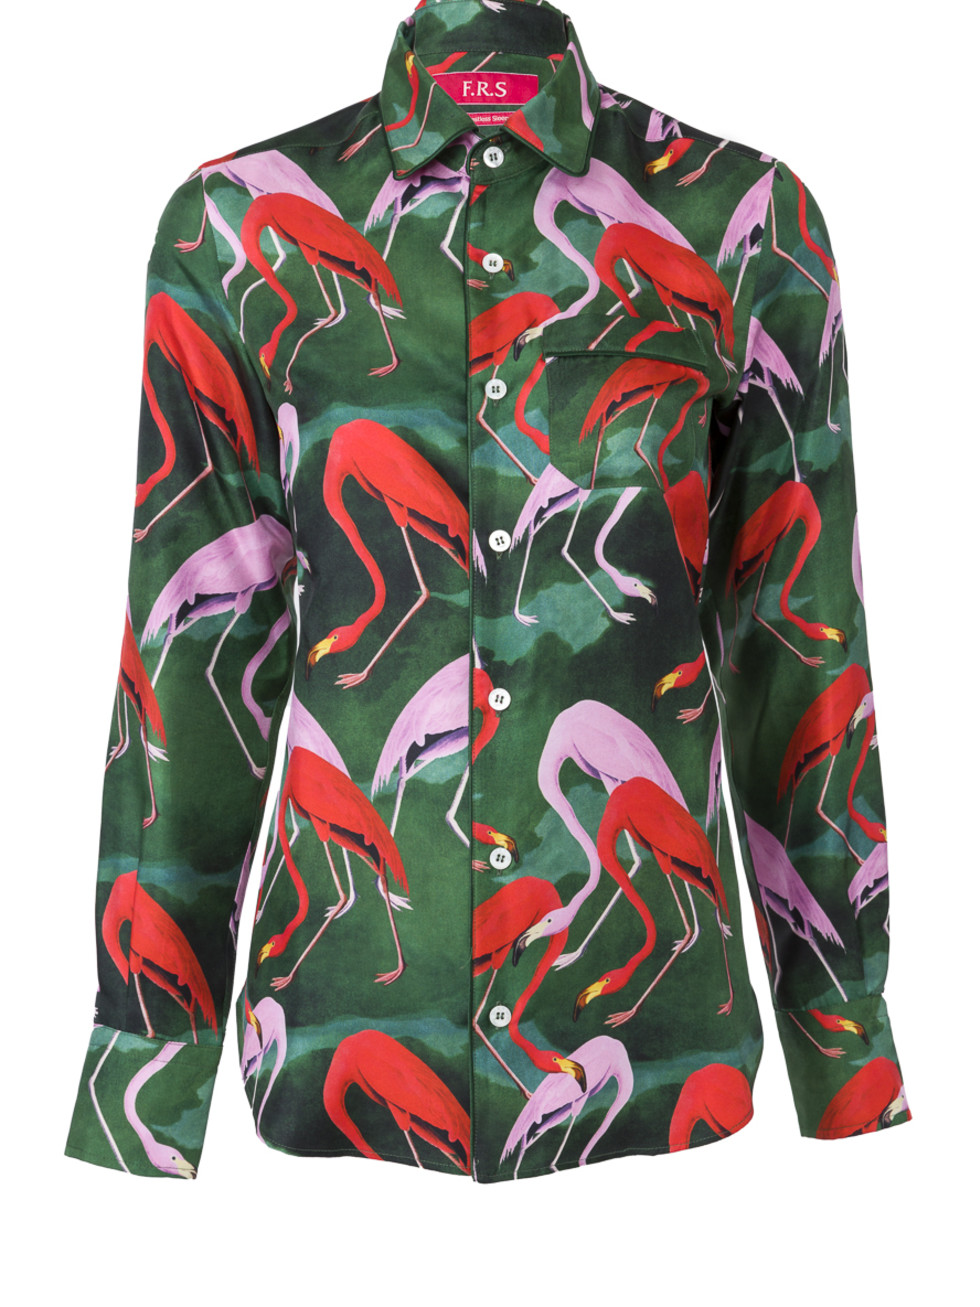 For Restless Sleeps flamingo patterned pajama top The Webster Lane Crawford collaboration